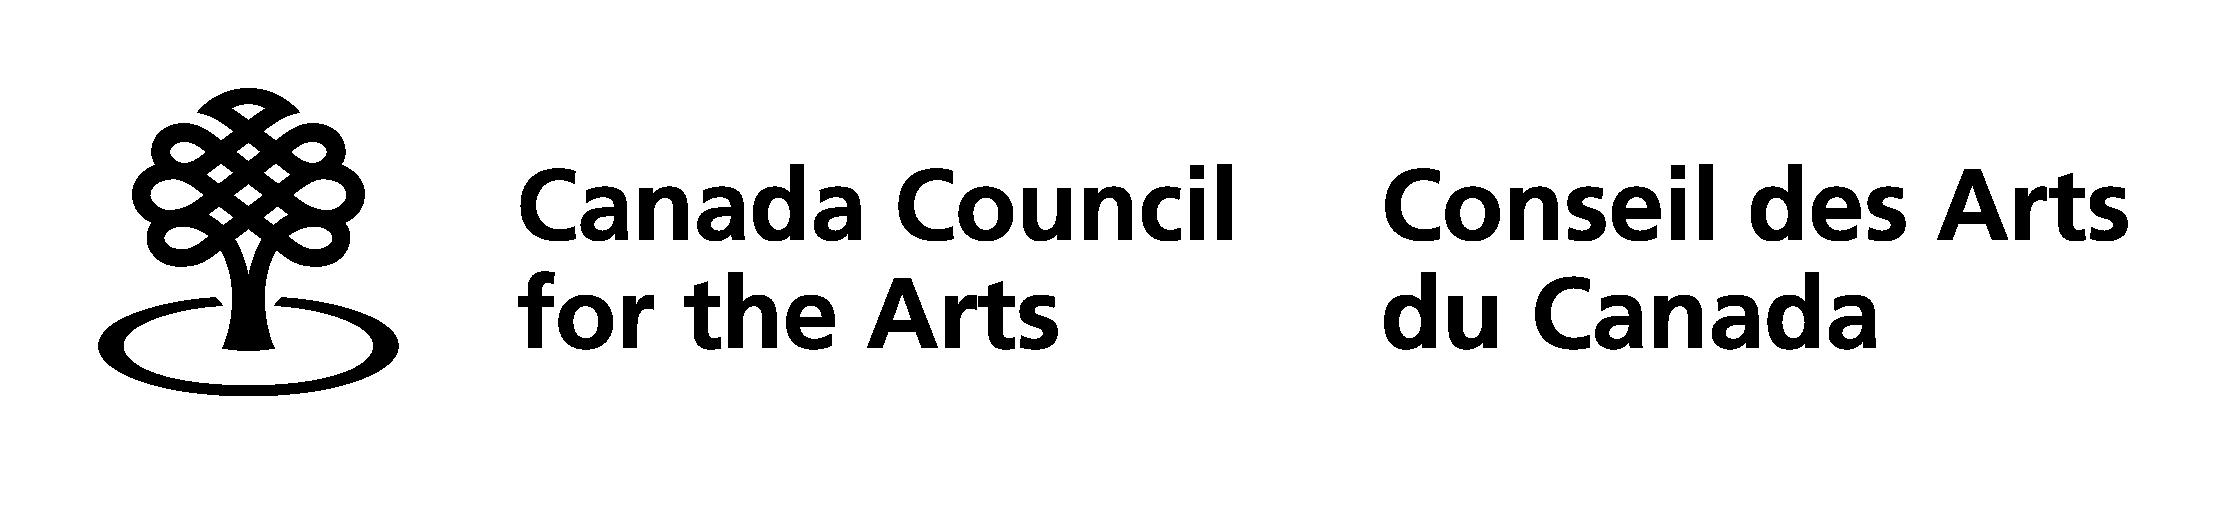 canada council logo_e_l